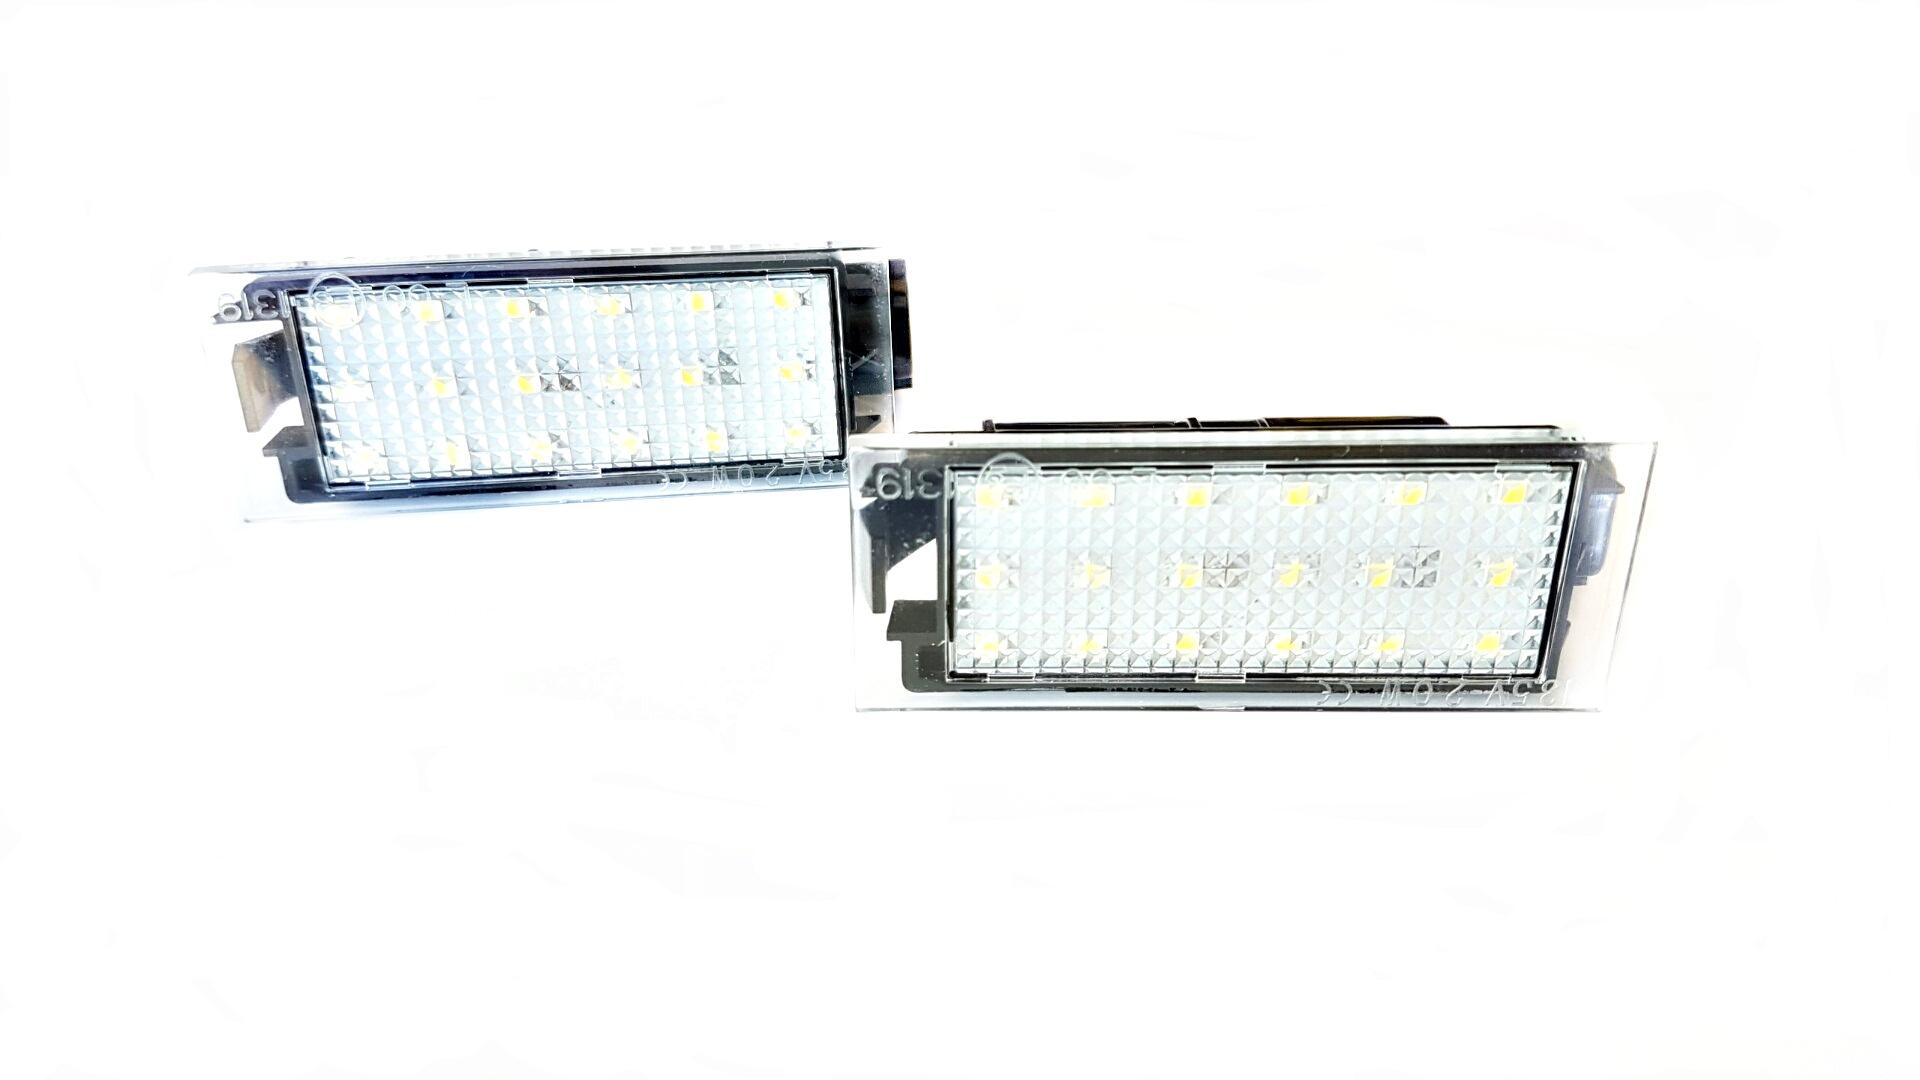 PLAFONES LED RENAULT LMD032401 LAGUNA COUPE